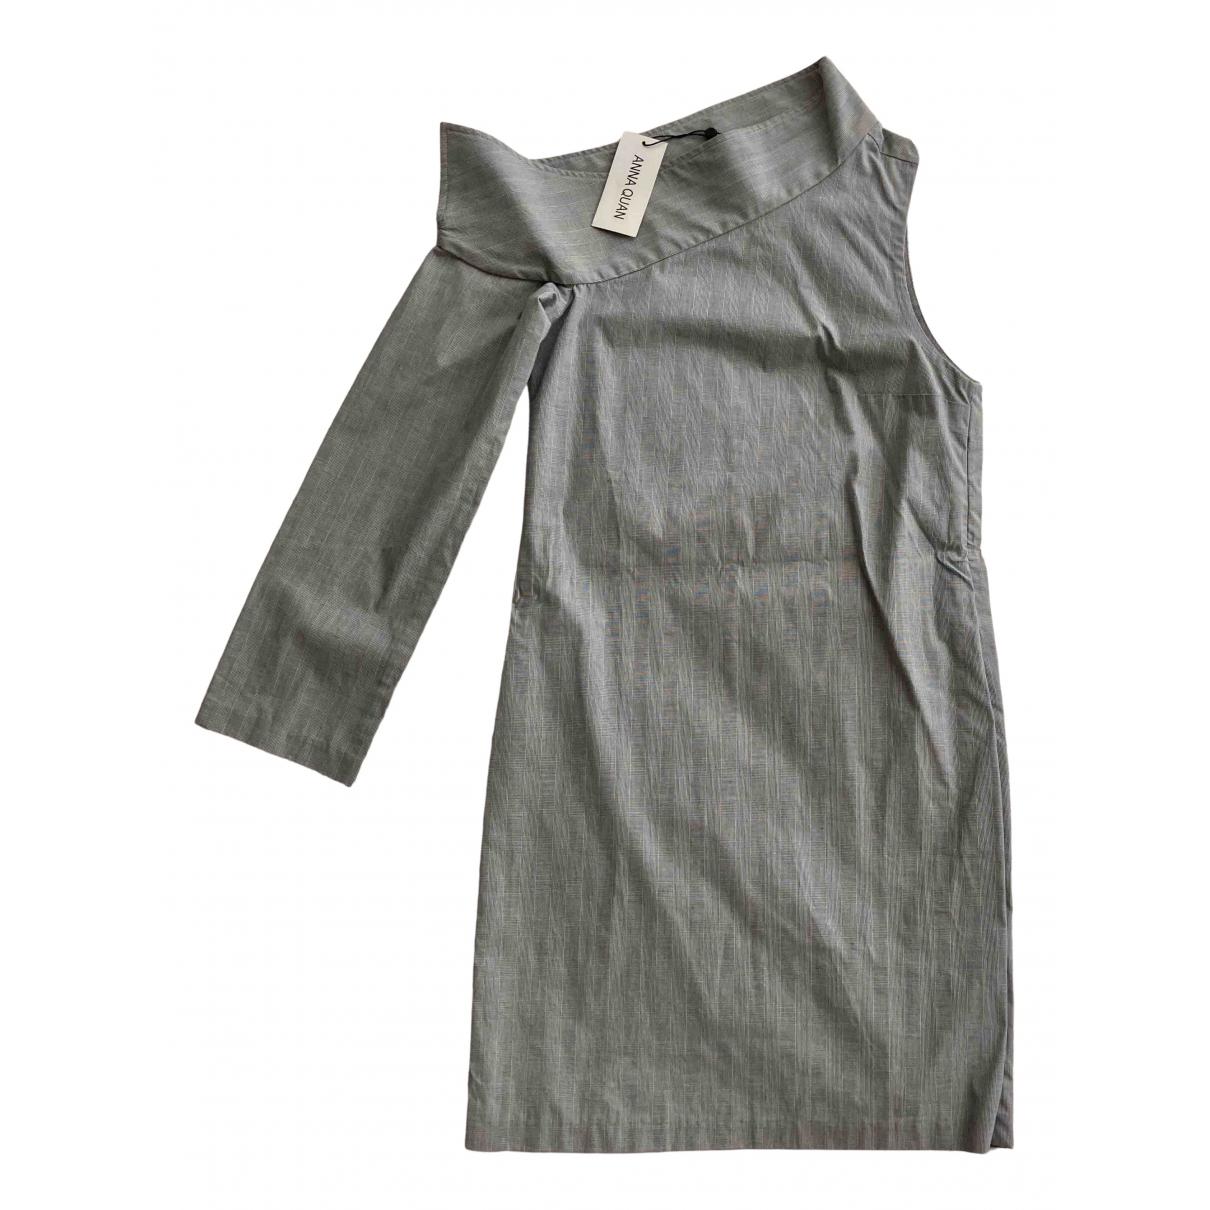 Anna Quan \N Kleid in  Grau Baumwolle - Elasthan